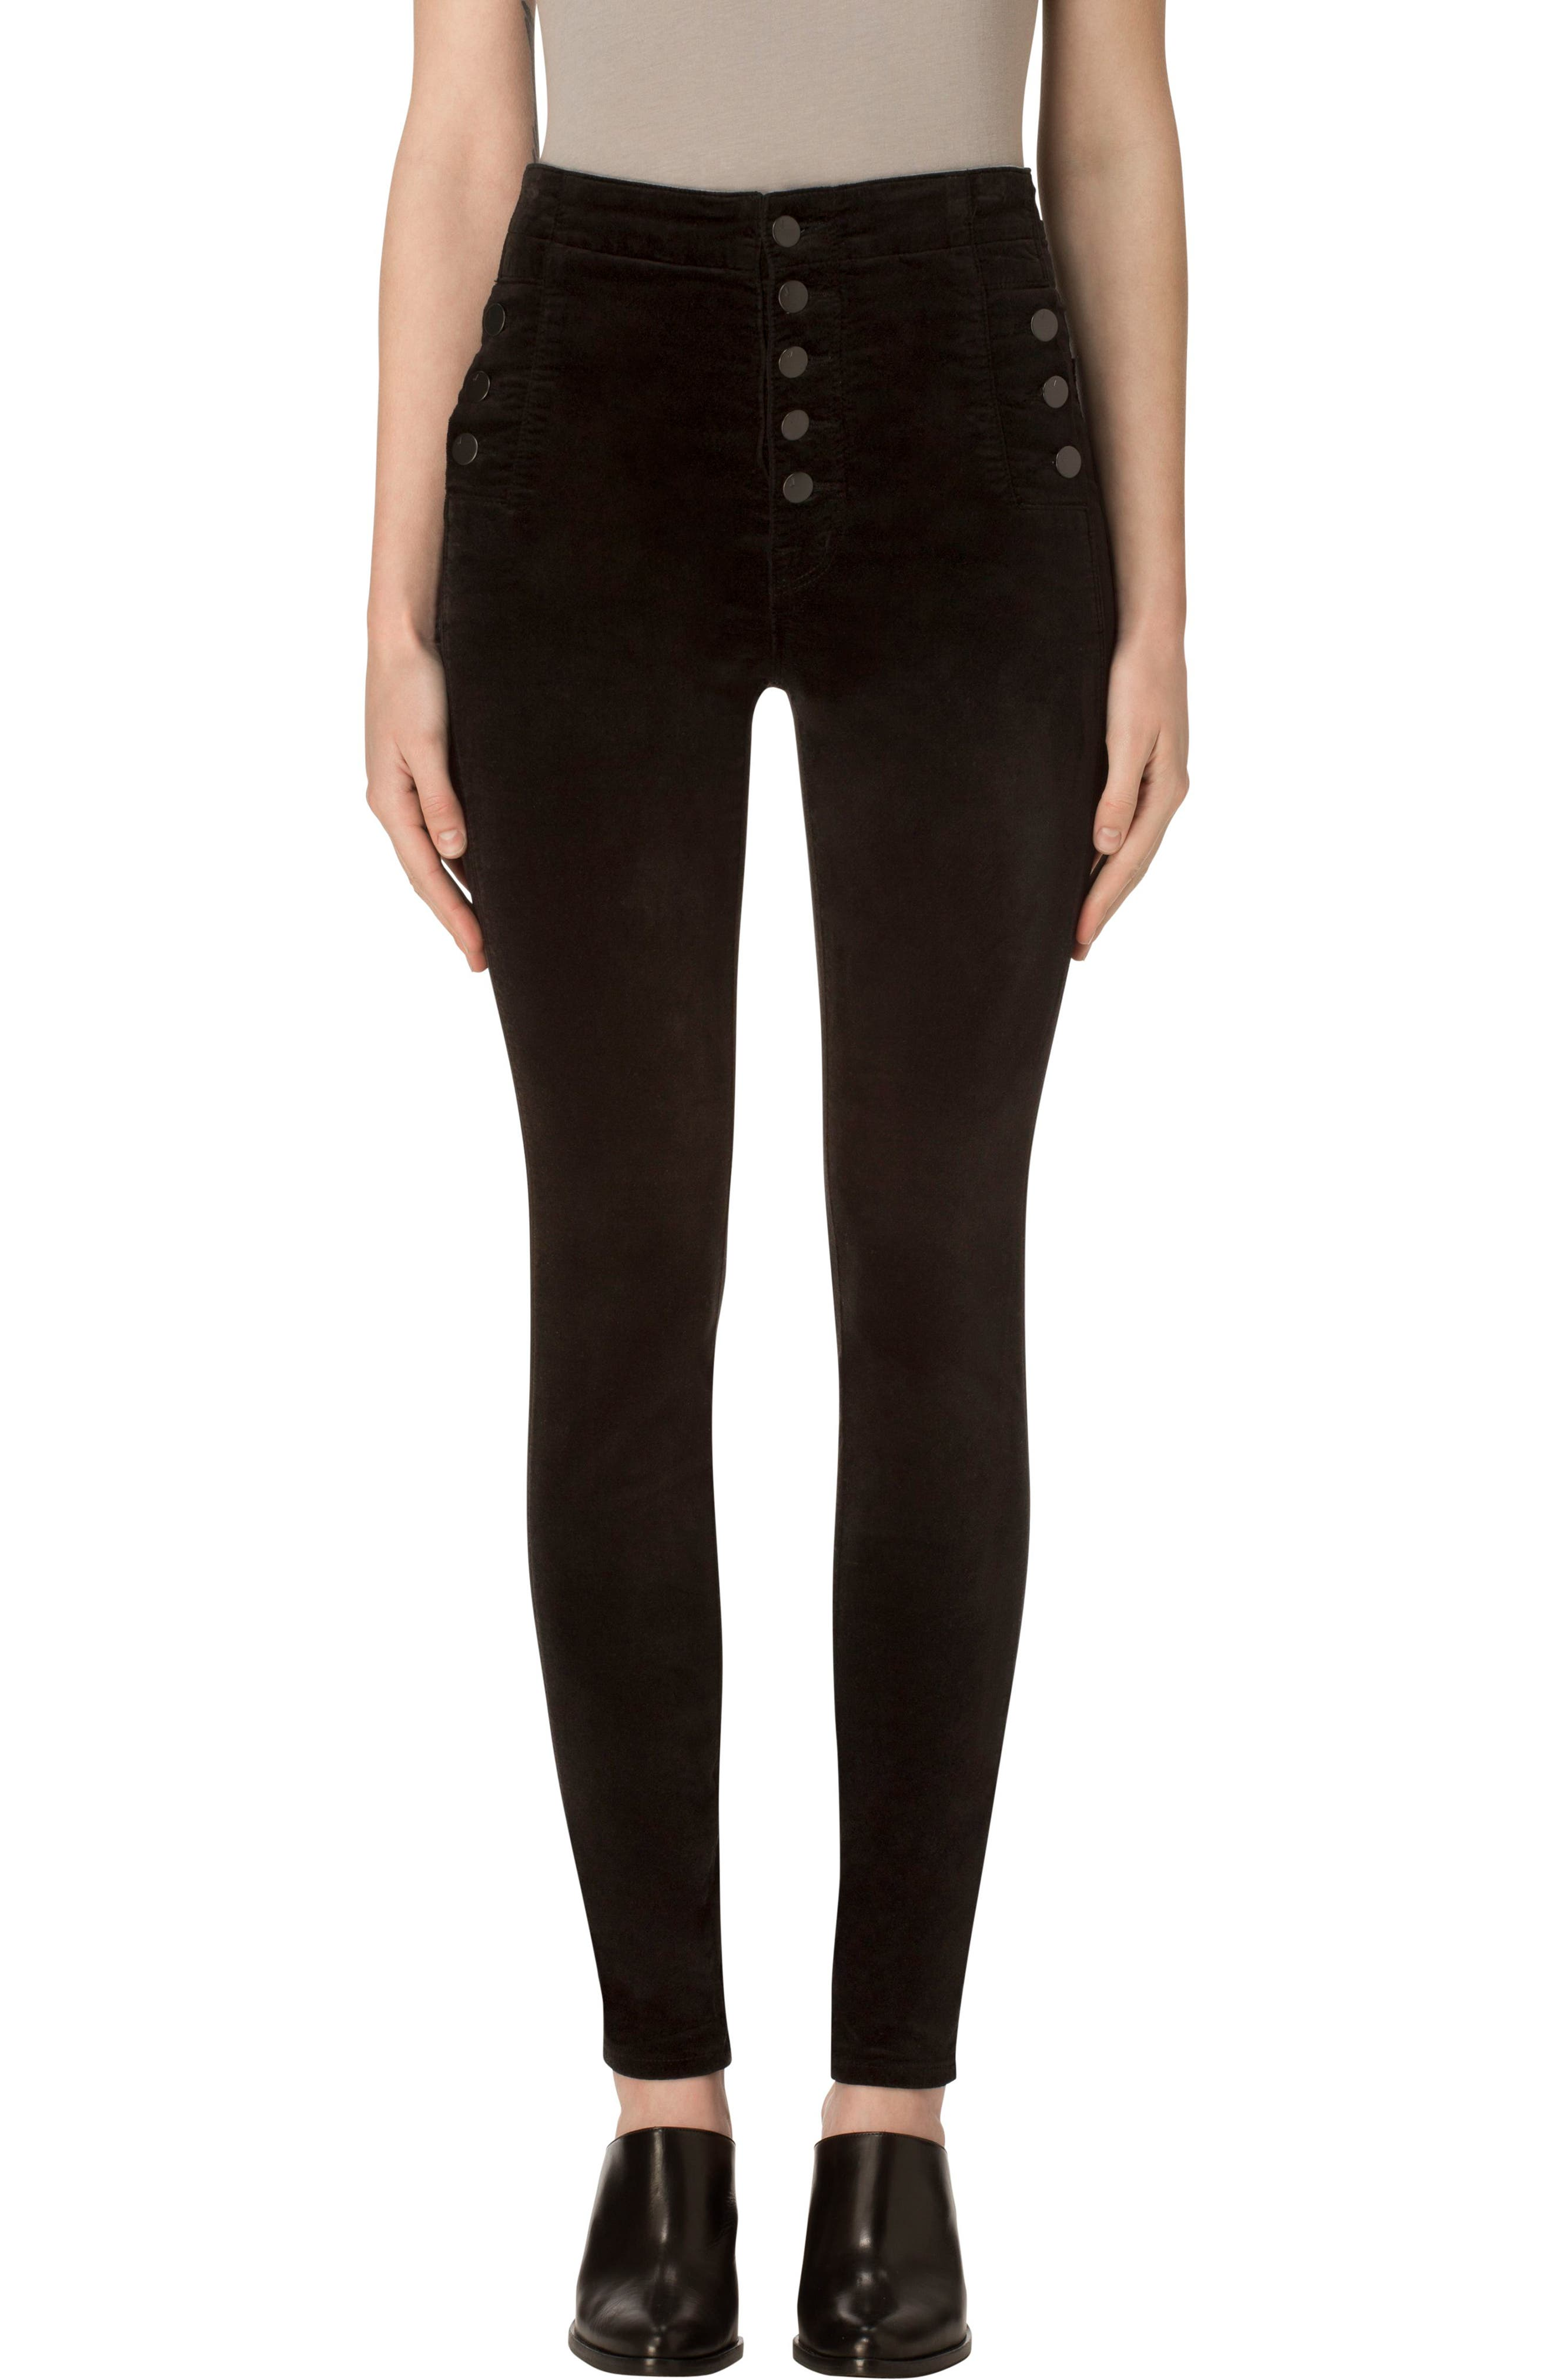 Natasha Sky High Velvet Skinny Pants,                             Main thumbnail 1, color,                             BLACK